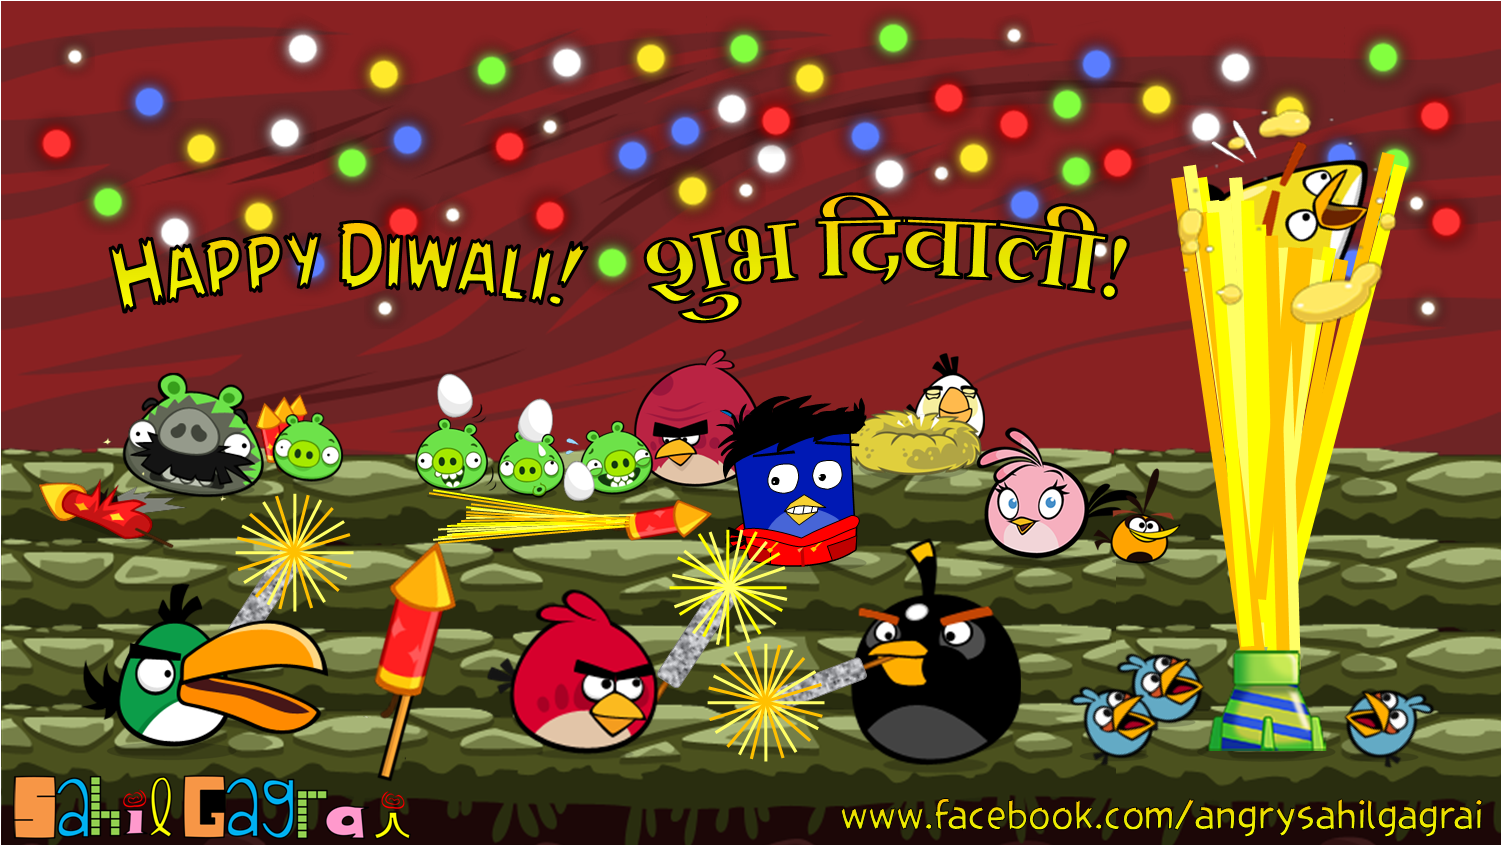 Angry Birds celebrating Diwali!